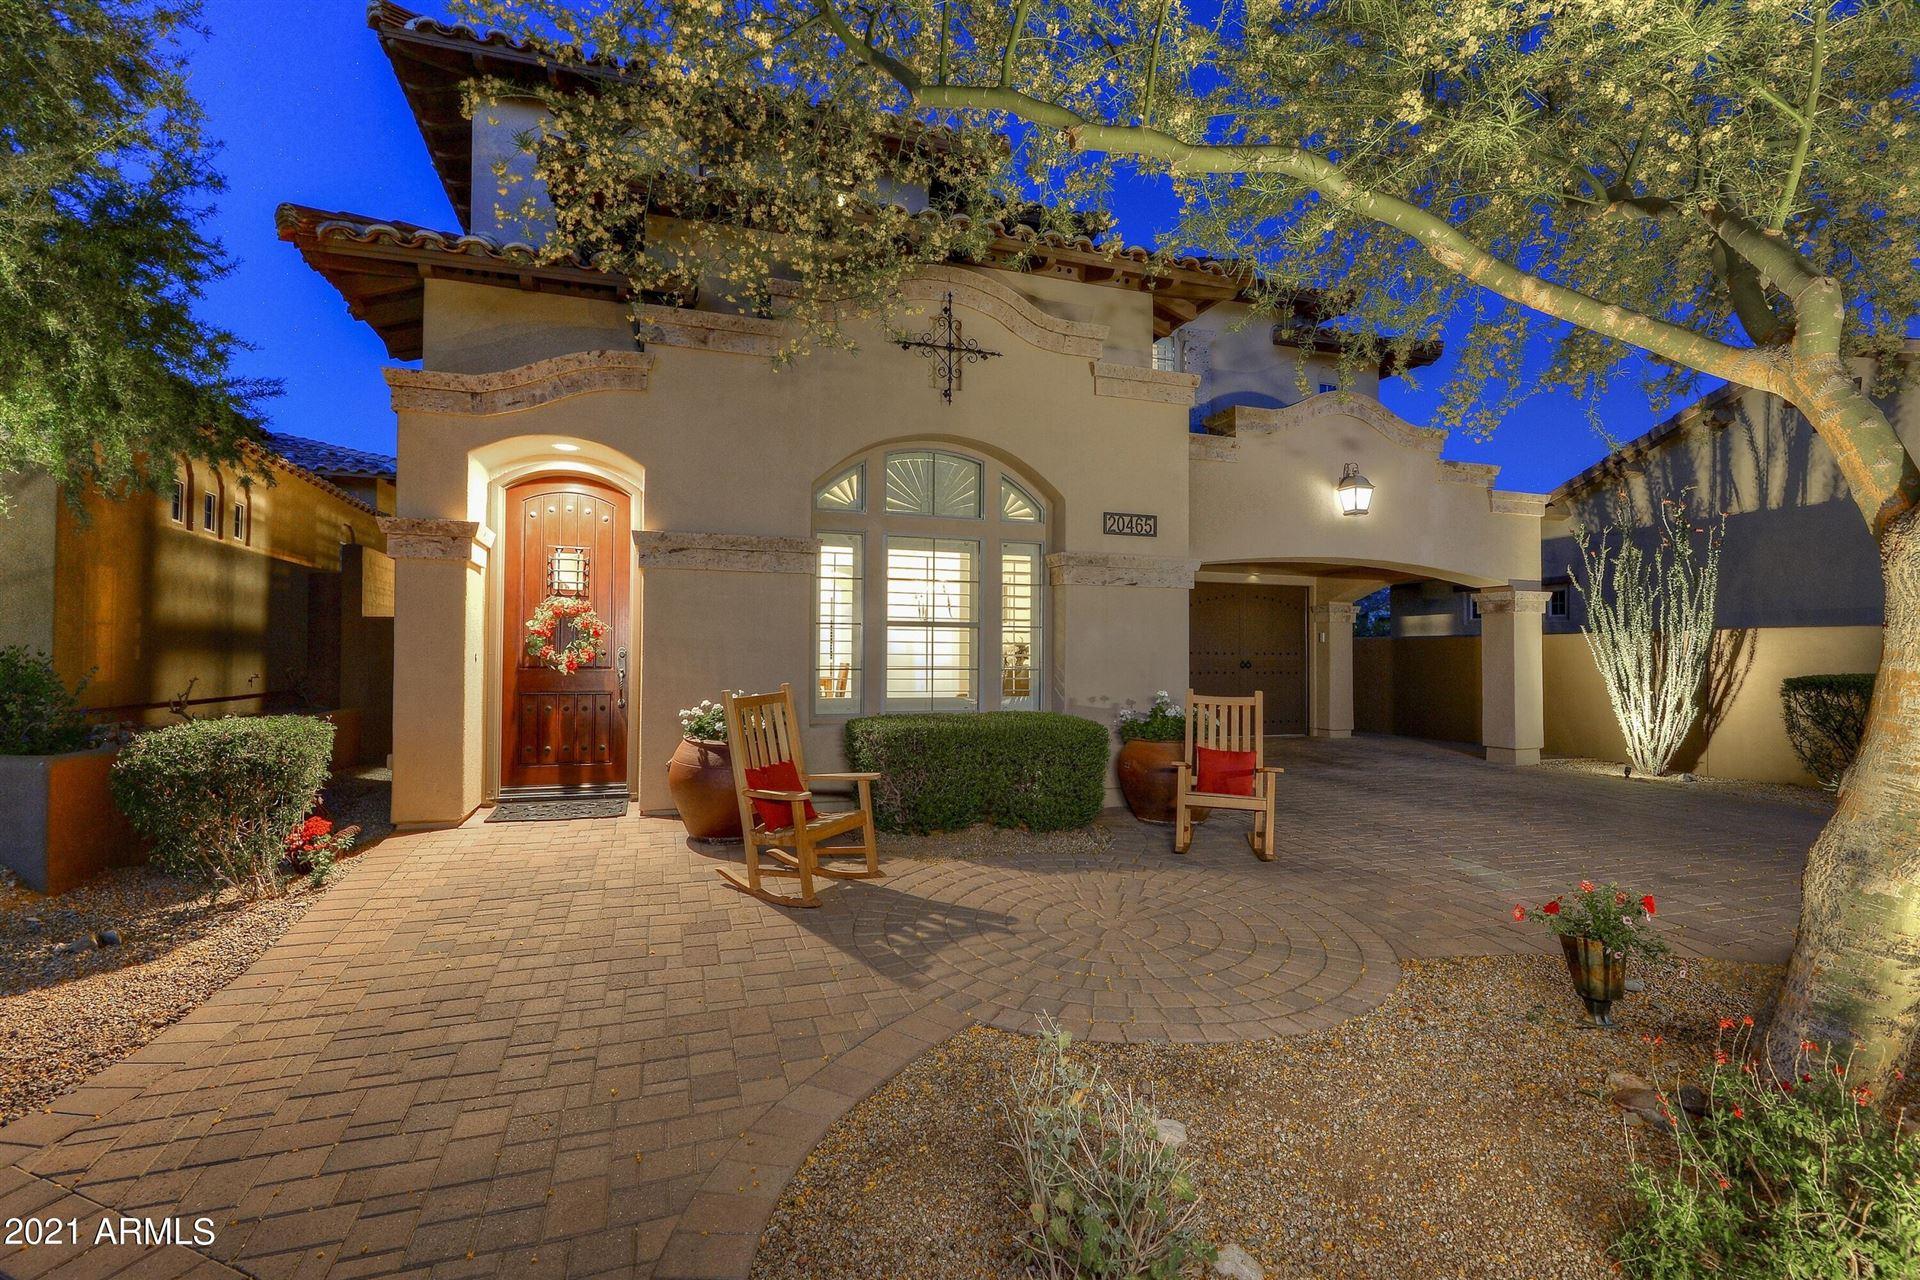 Photo of 20465 N 98TH Street, Scottsdale, AZ 85255 (MLS # 6232696)